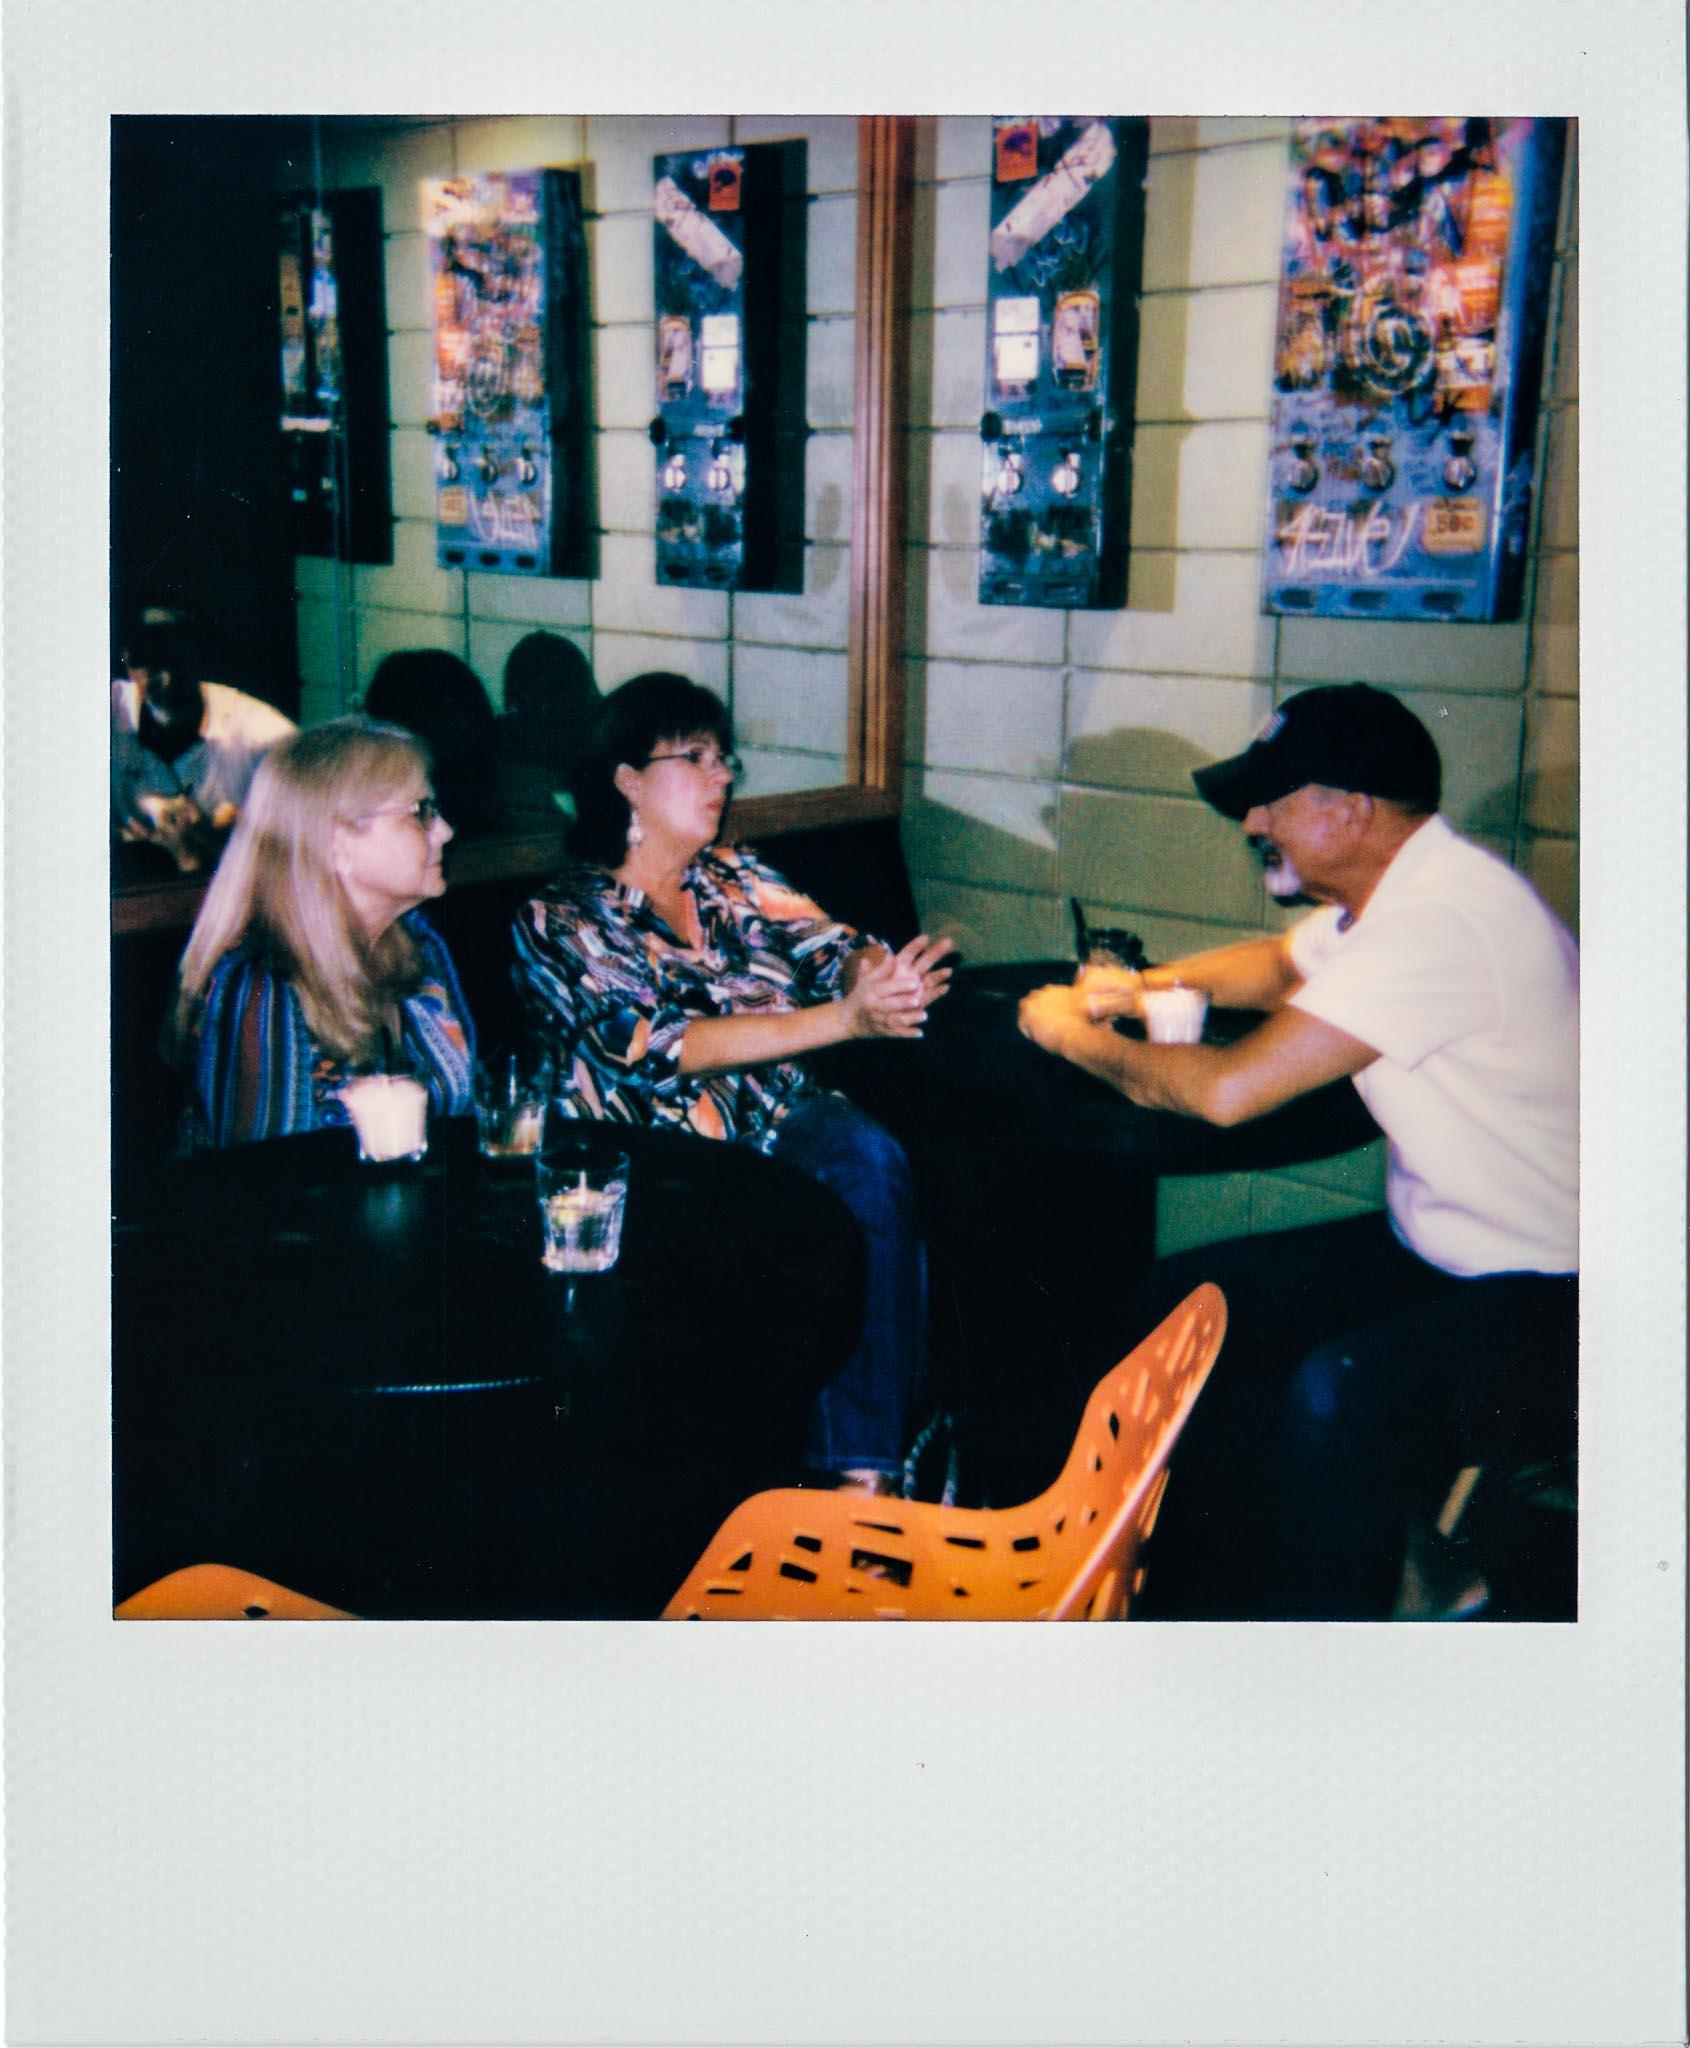 guests-wallys-polaroid.jpg